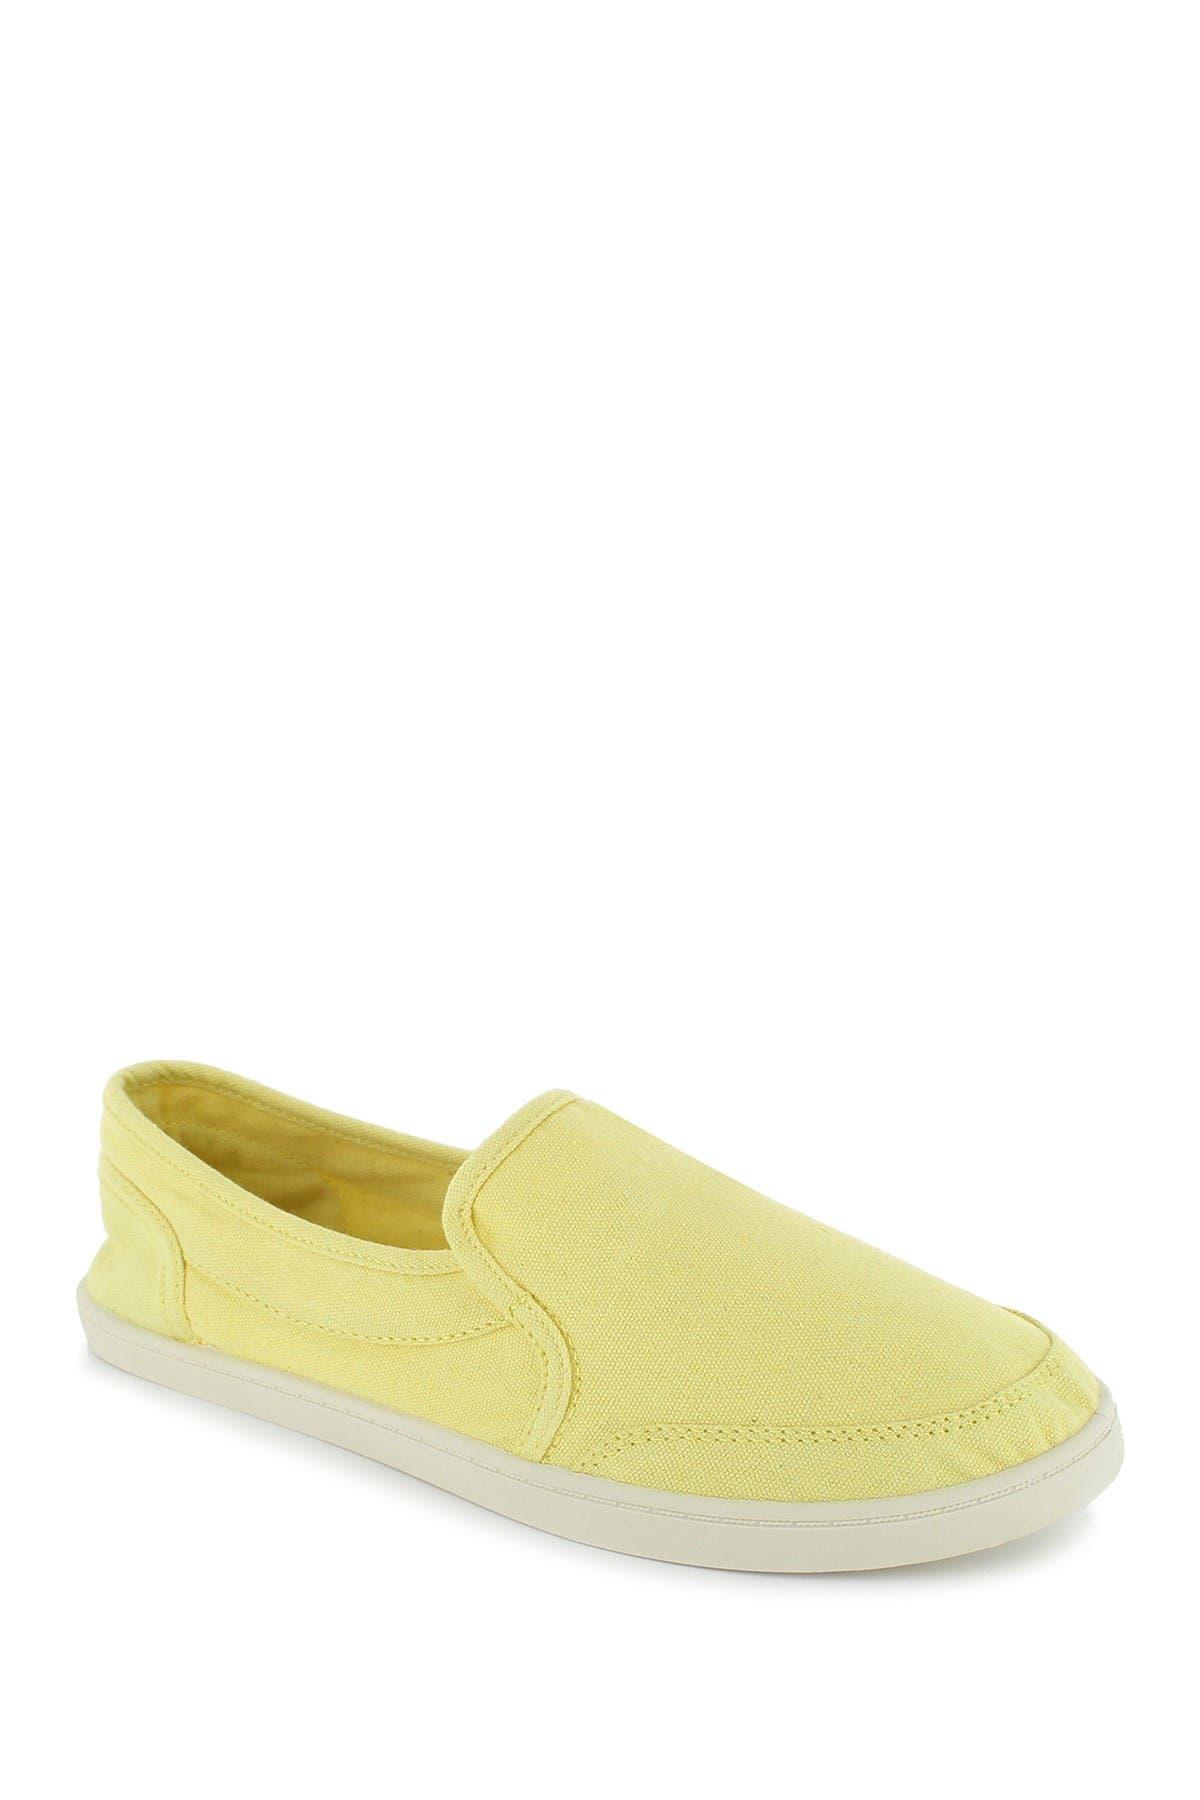 Image of Unionbay Fun Slip-On Sneaker